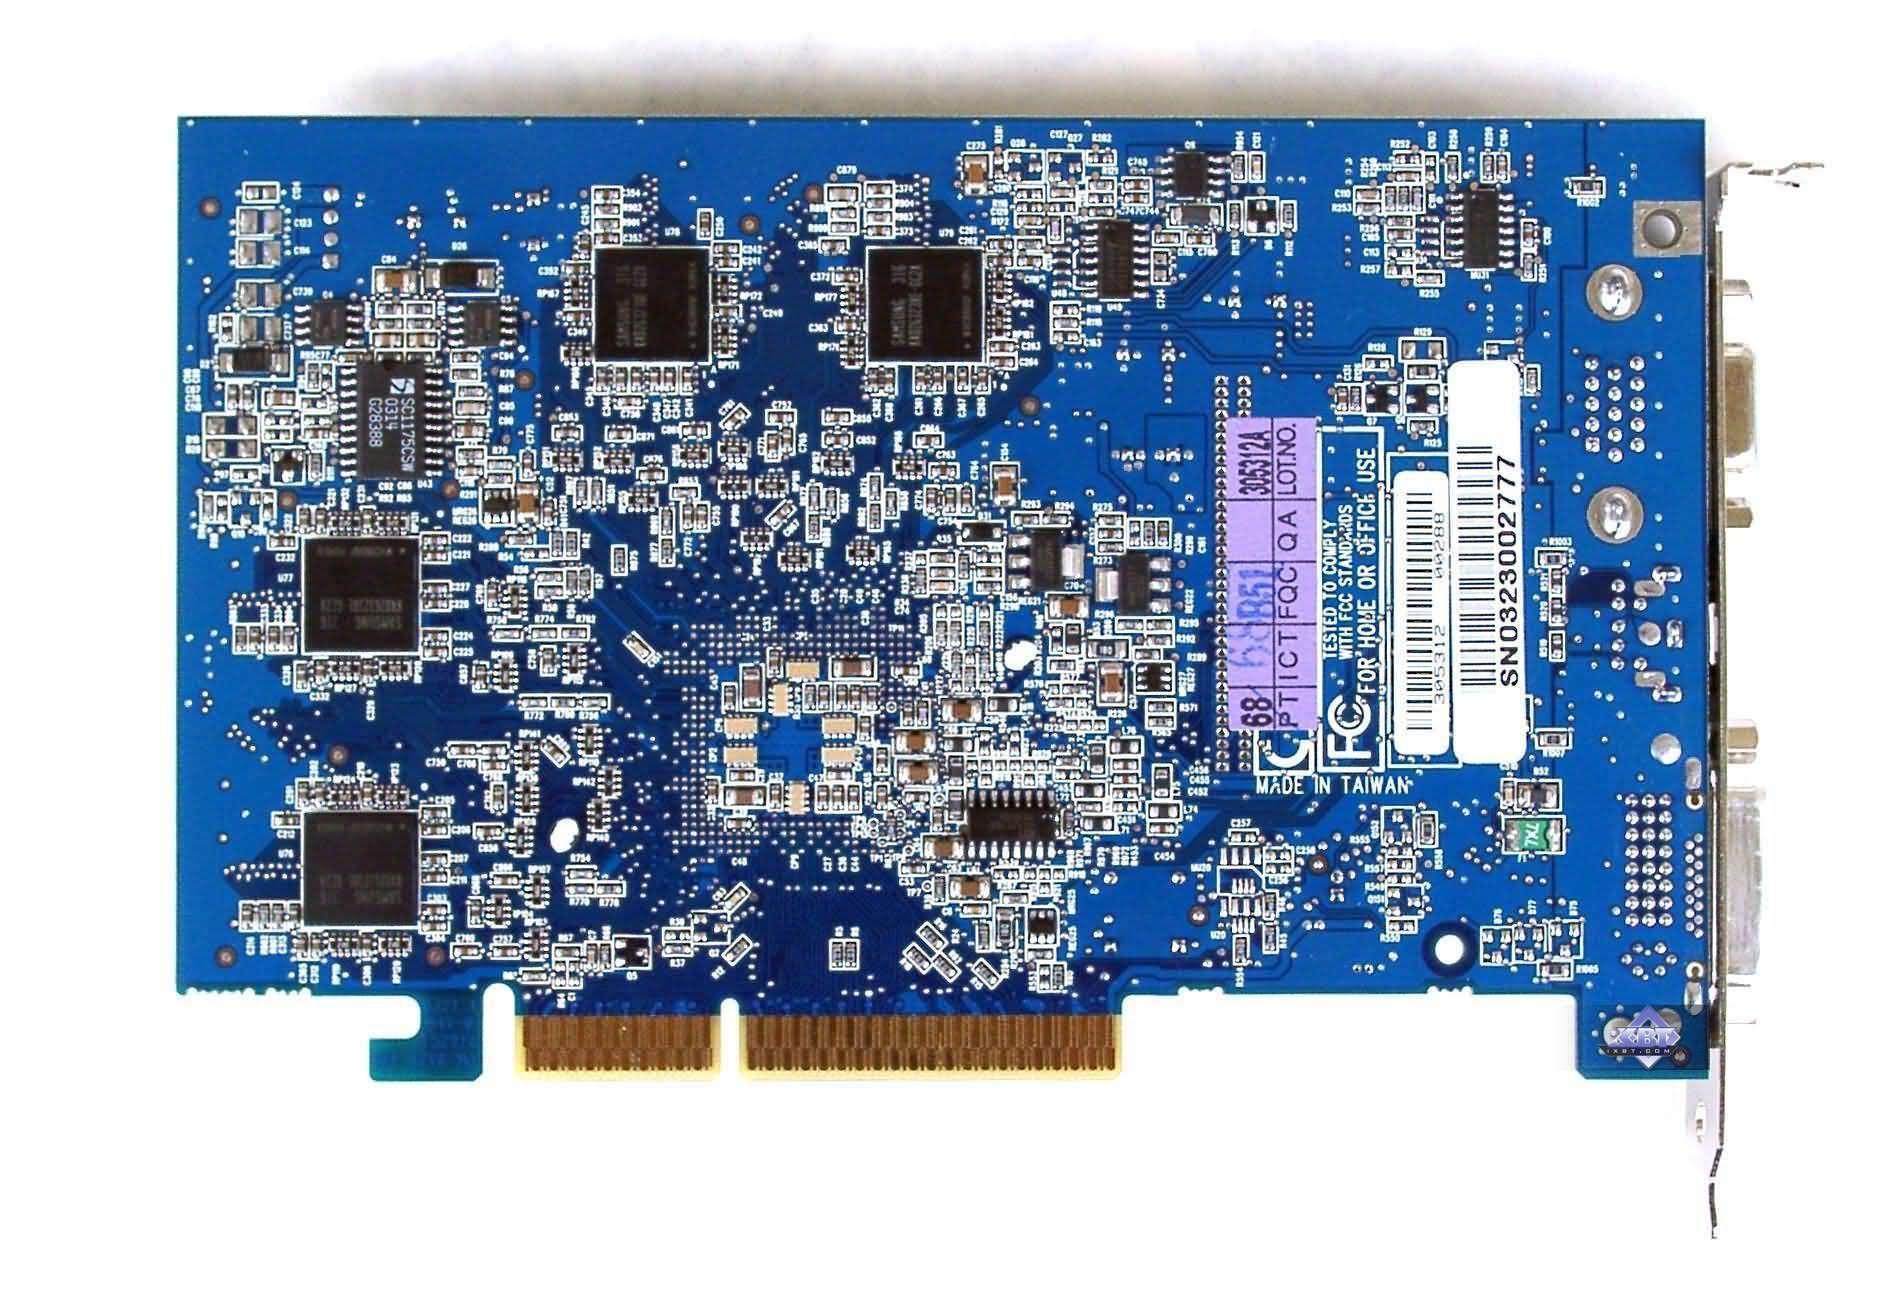 Драйвера Radeon 9600 Pro